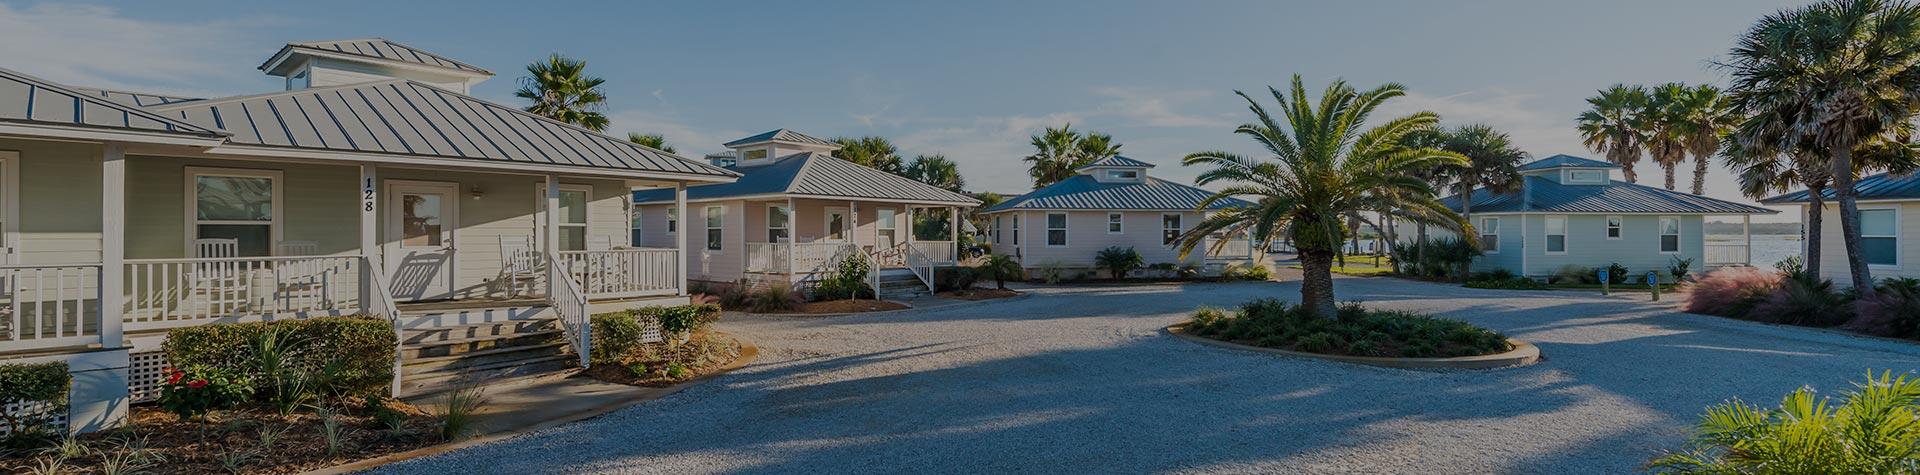 Cottages at Devil's Elbow Fishing Resort